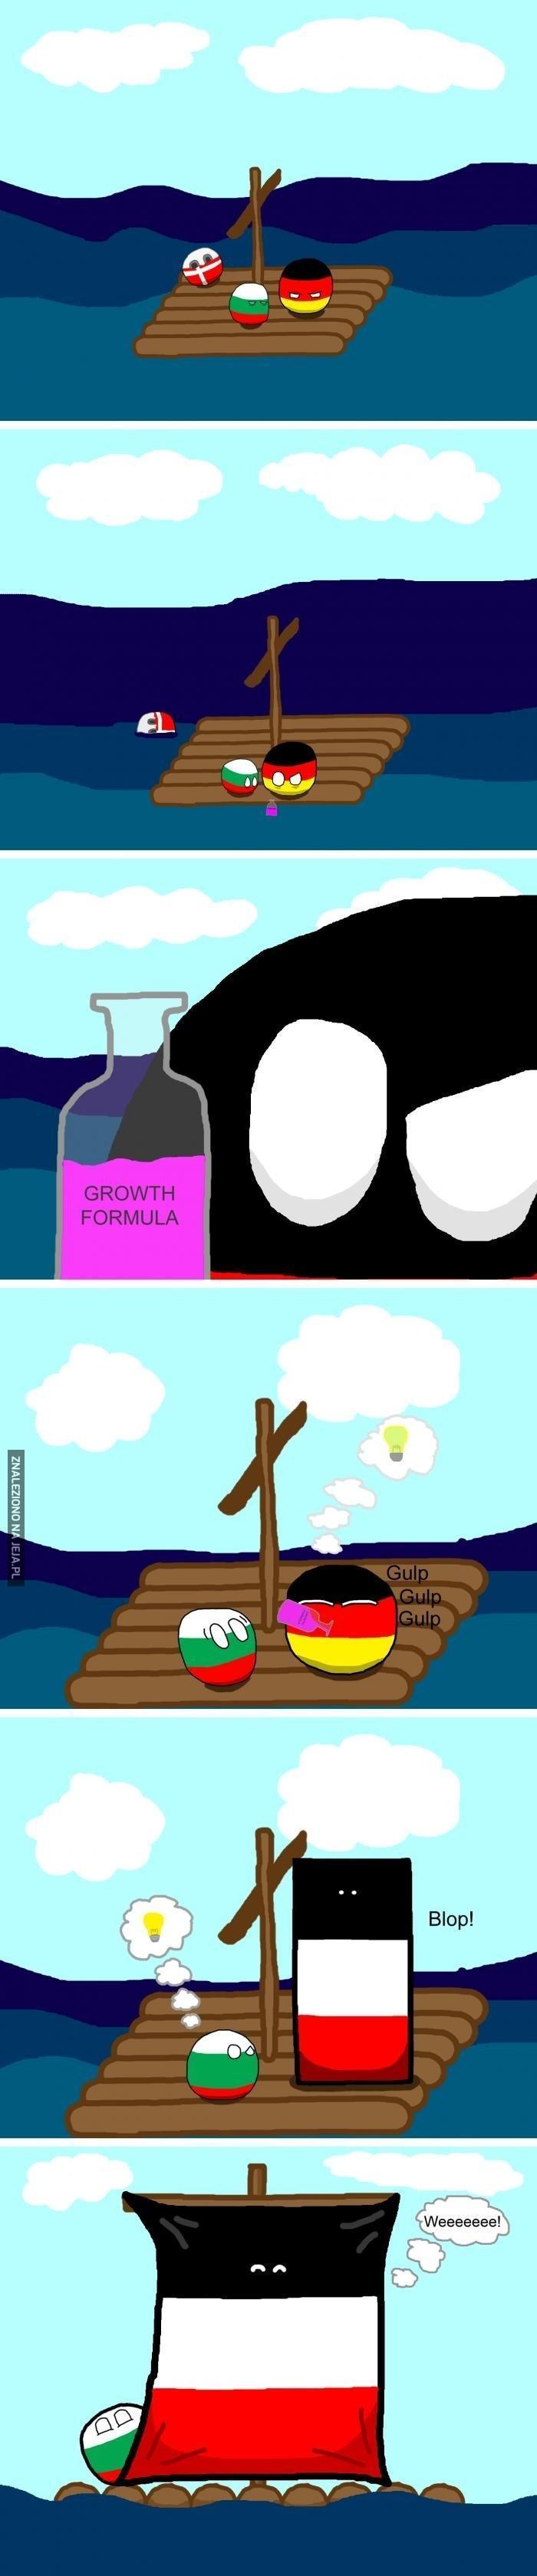 Eliksir wzrostu